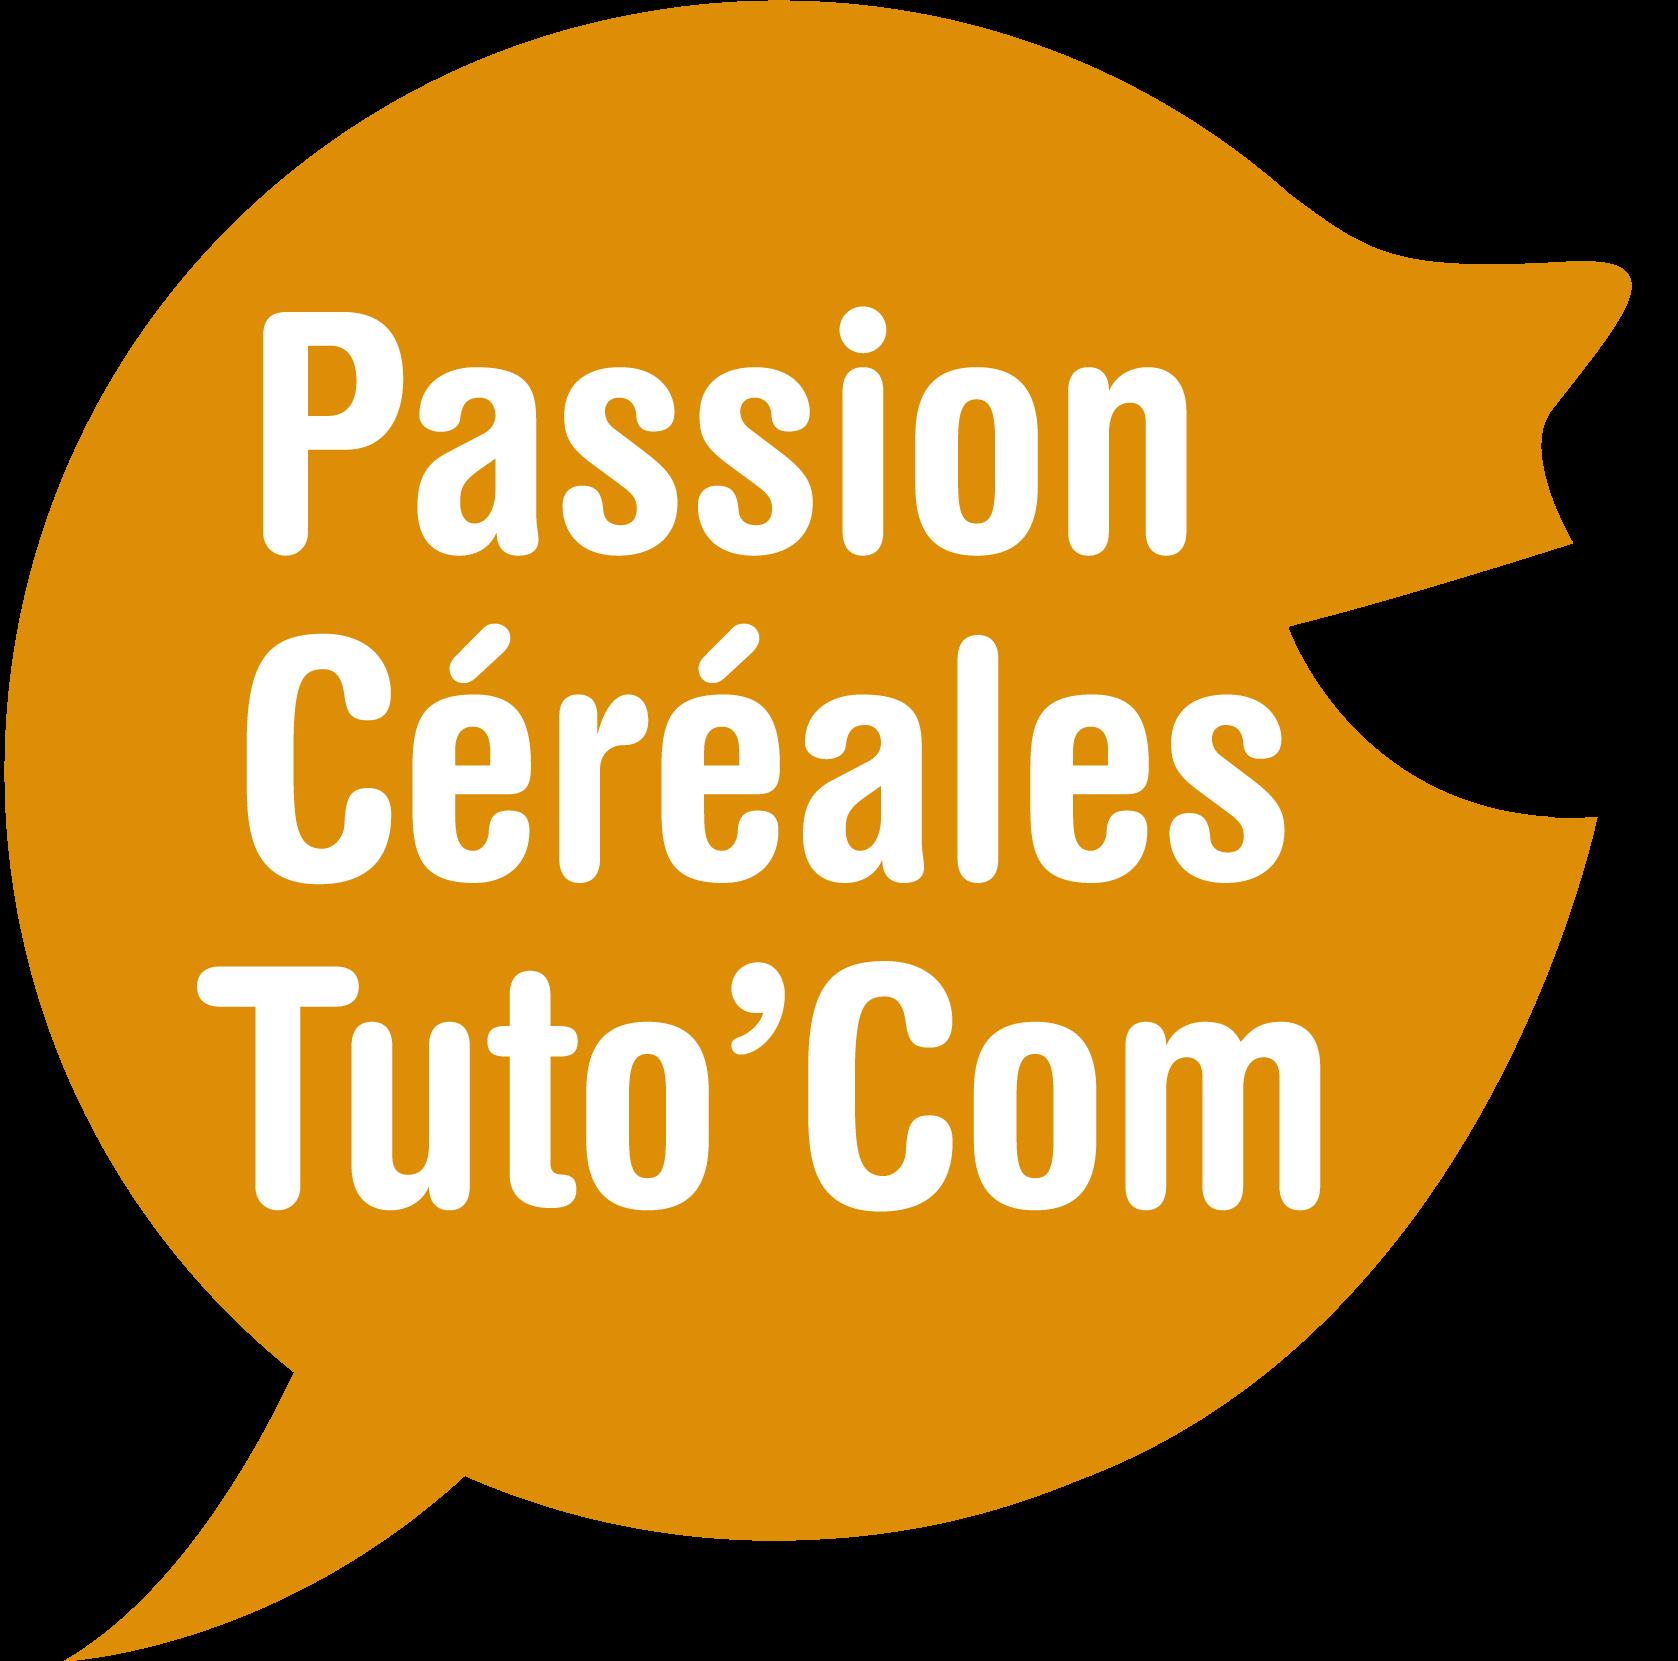 logo-tutocom-passion-ce-re-ales